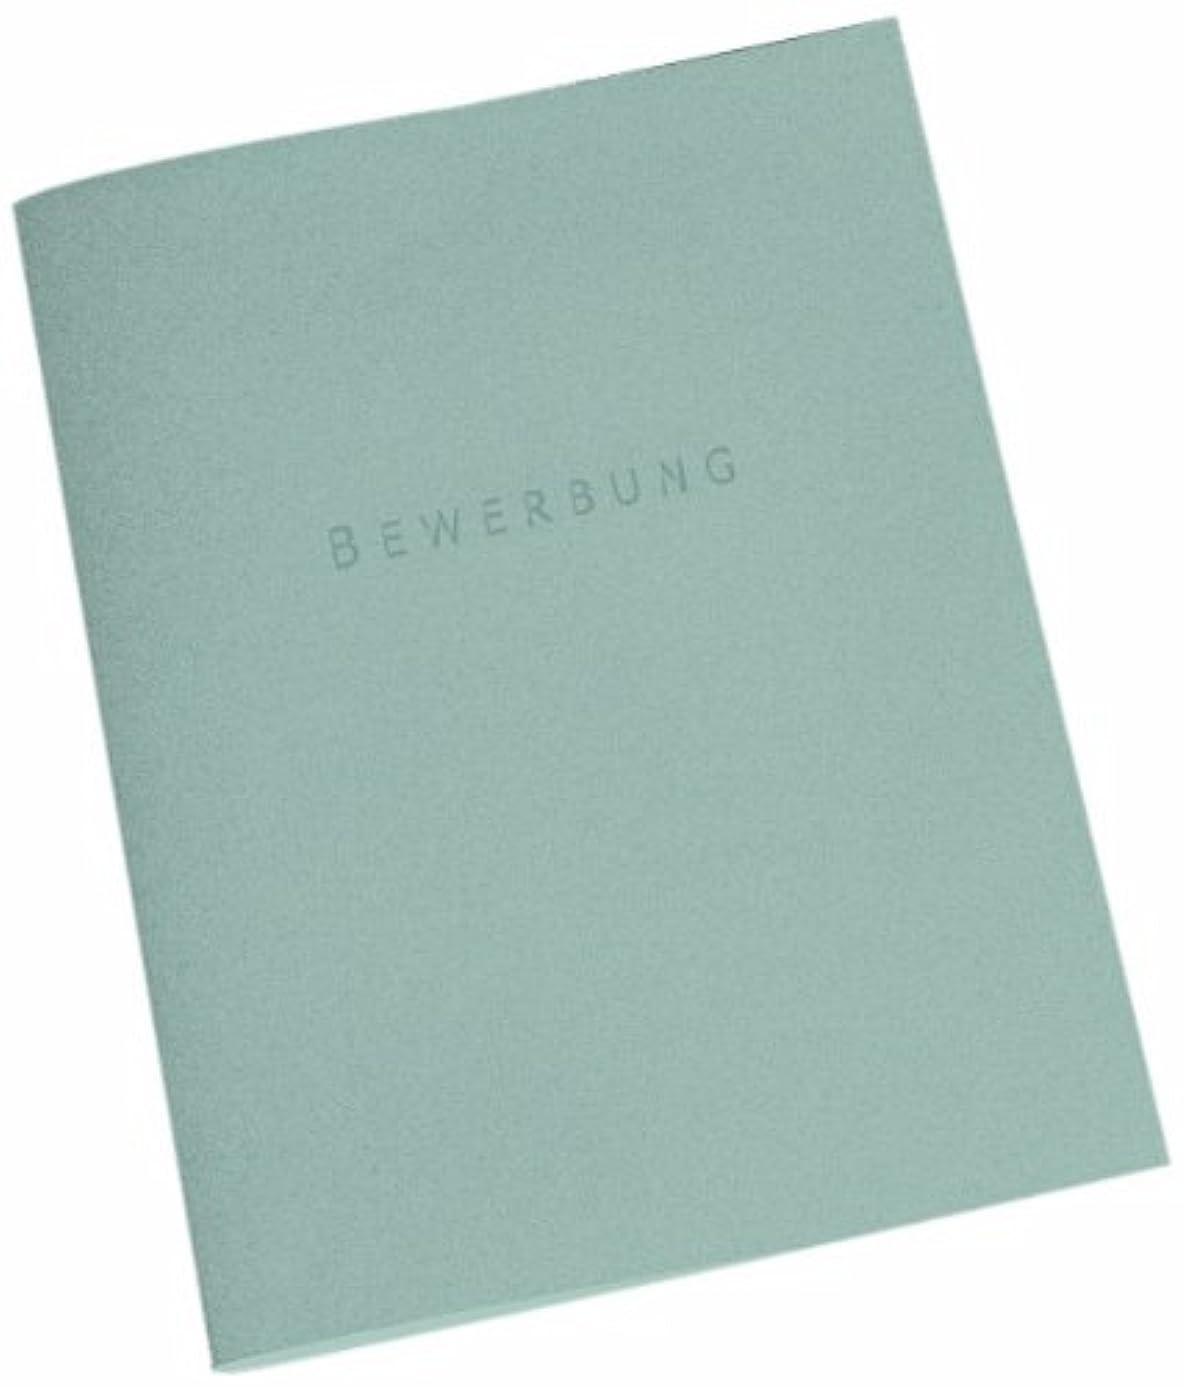 Elba 400013674 Metallic Portfolio Folder 3-Part Card for 30 DIN A4 Pages Set of 10 Silver